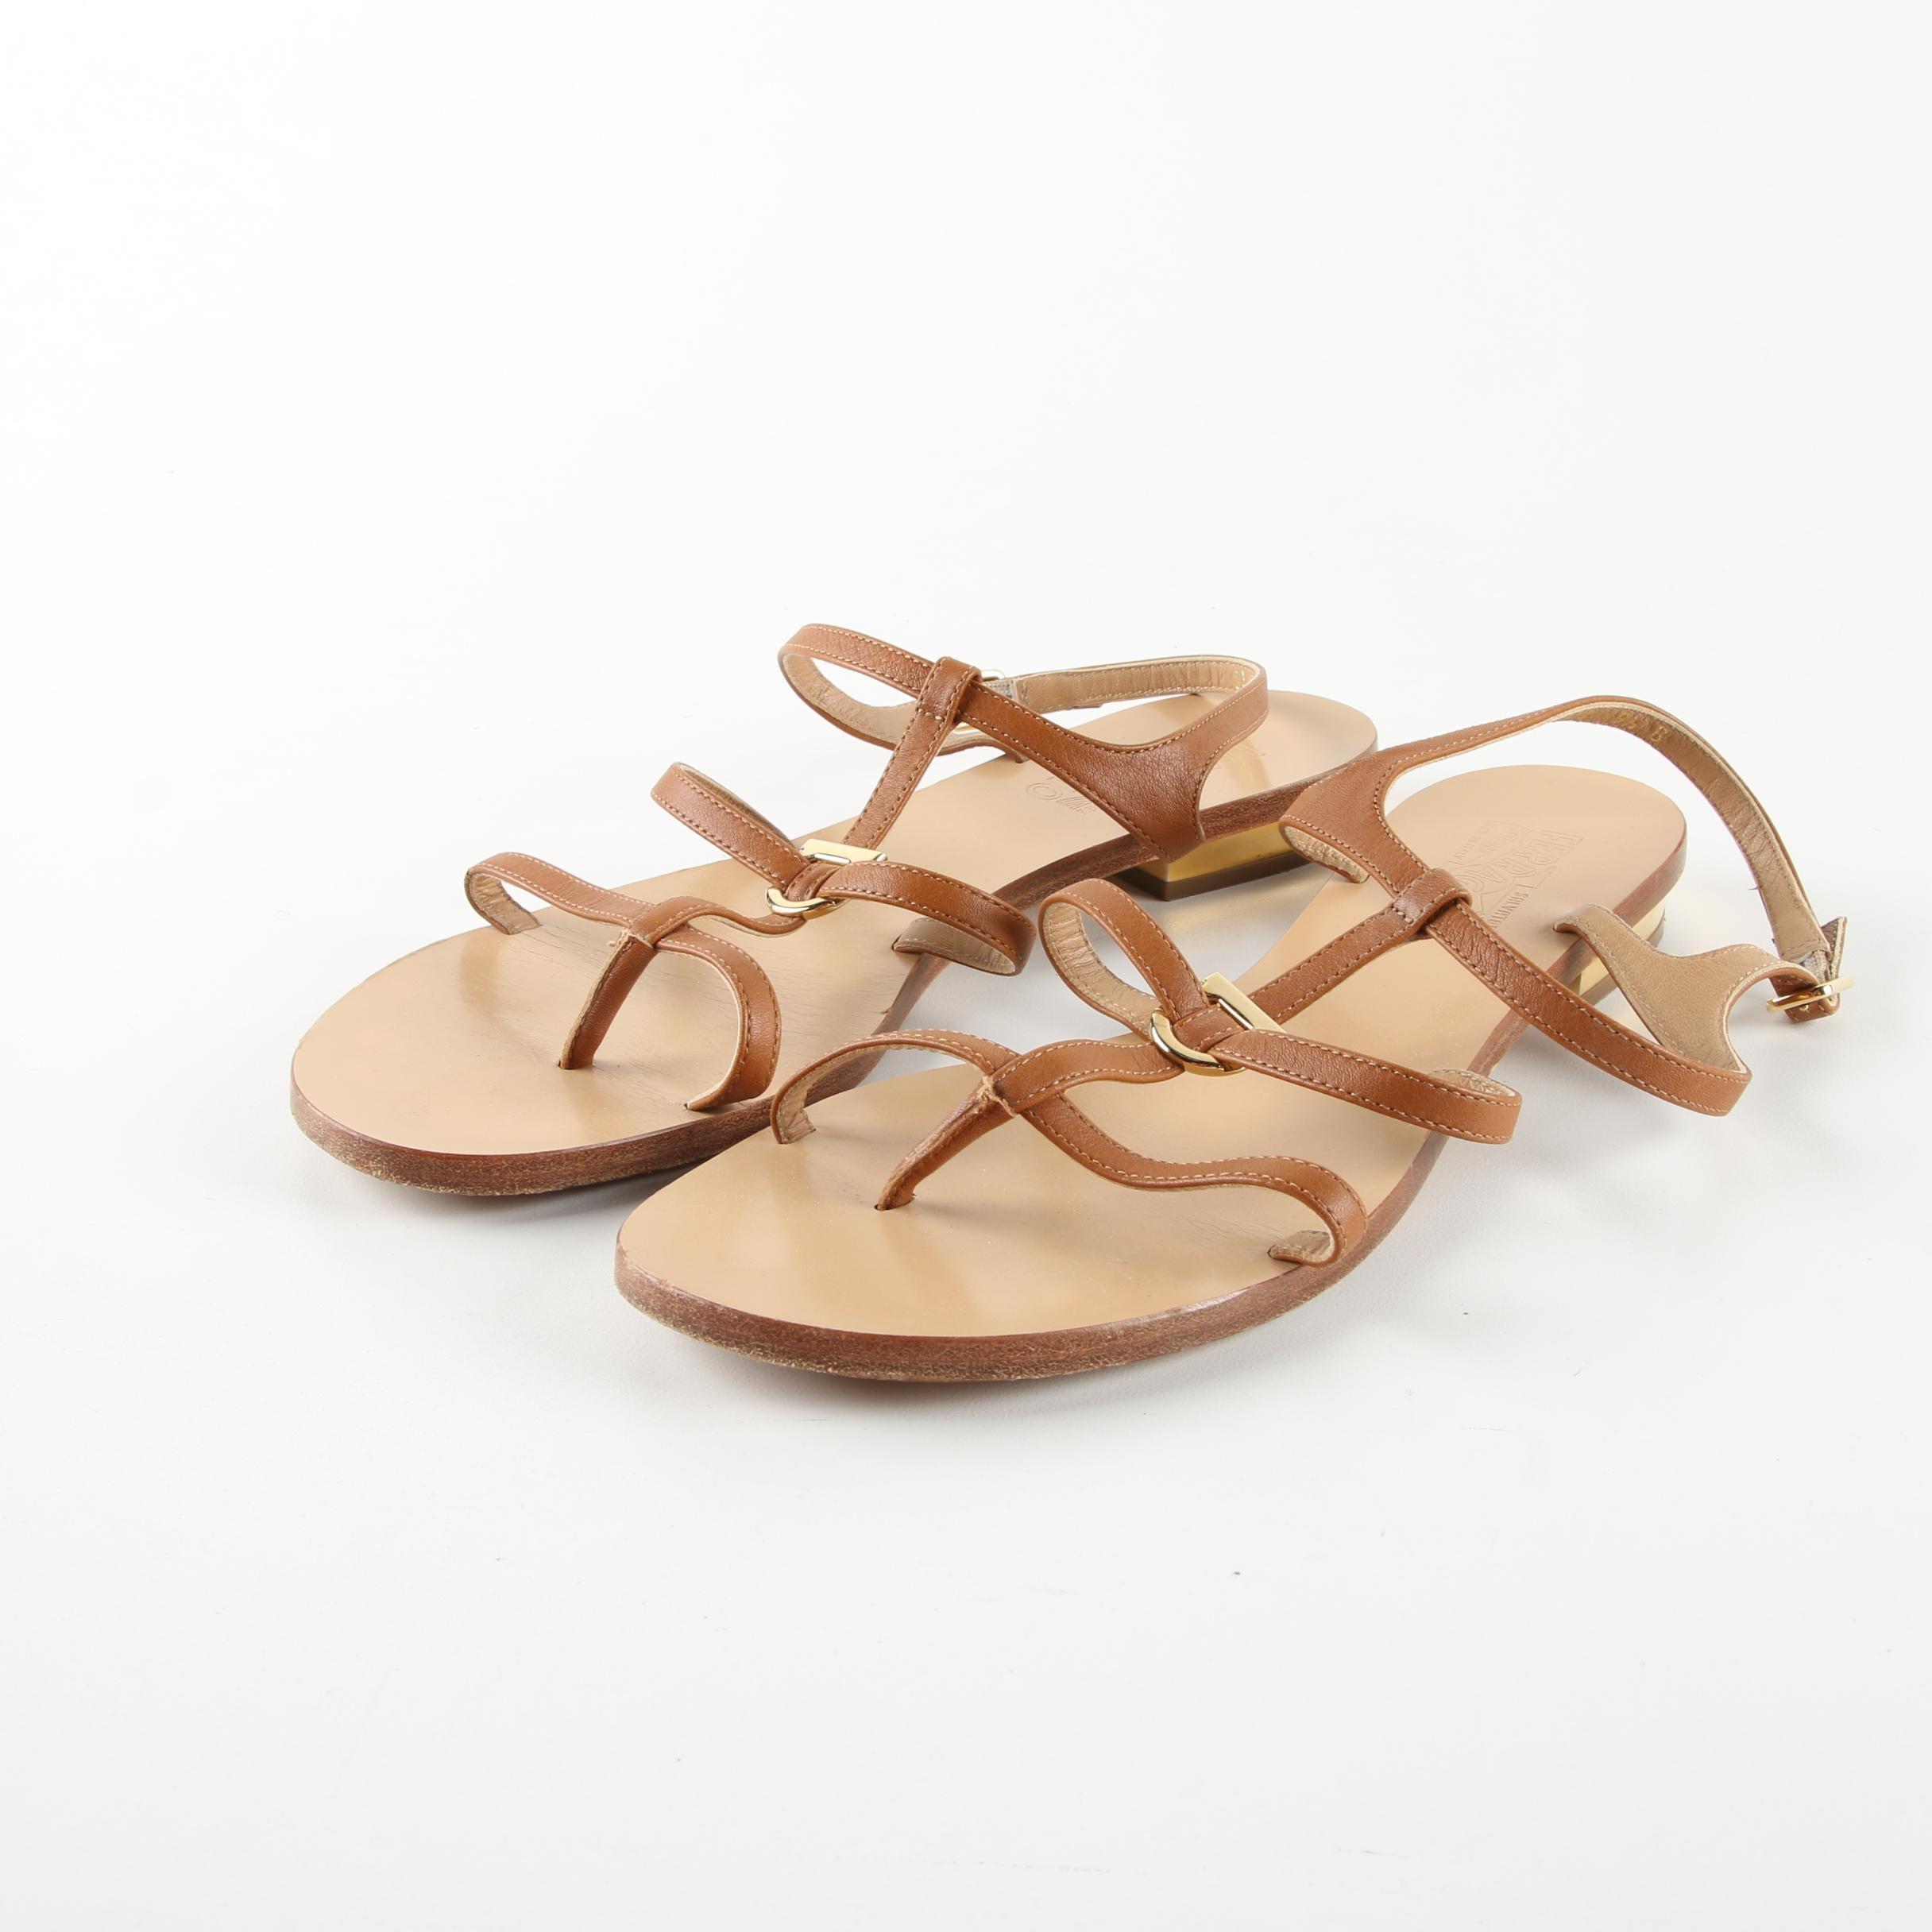 Women's Salvatore Ferragamo Brown Leather Sandals, Made in Italy